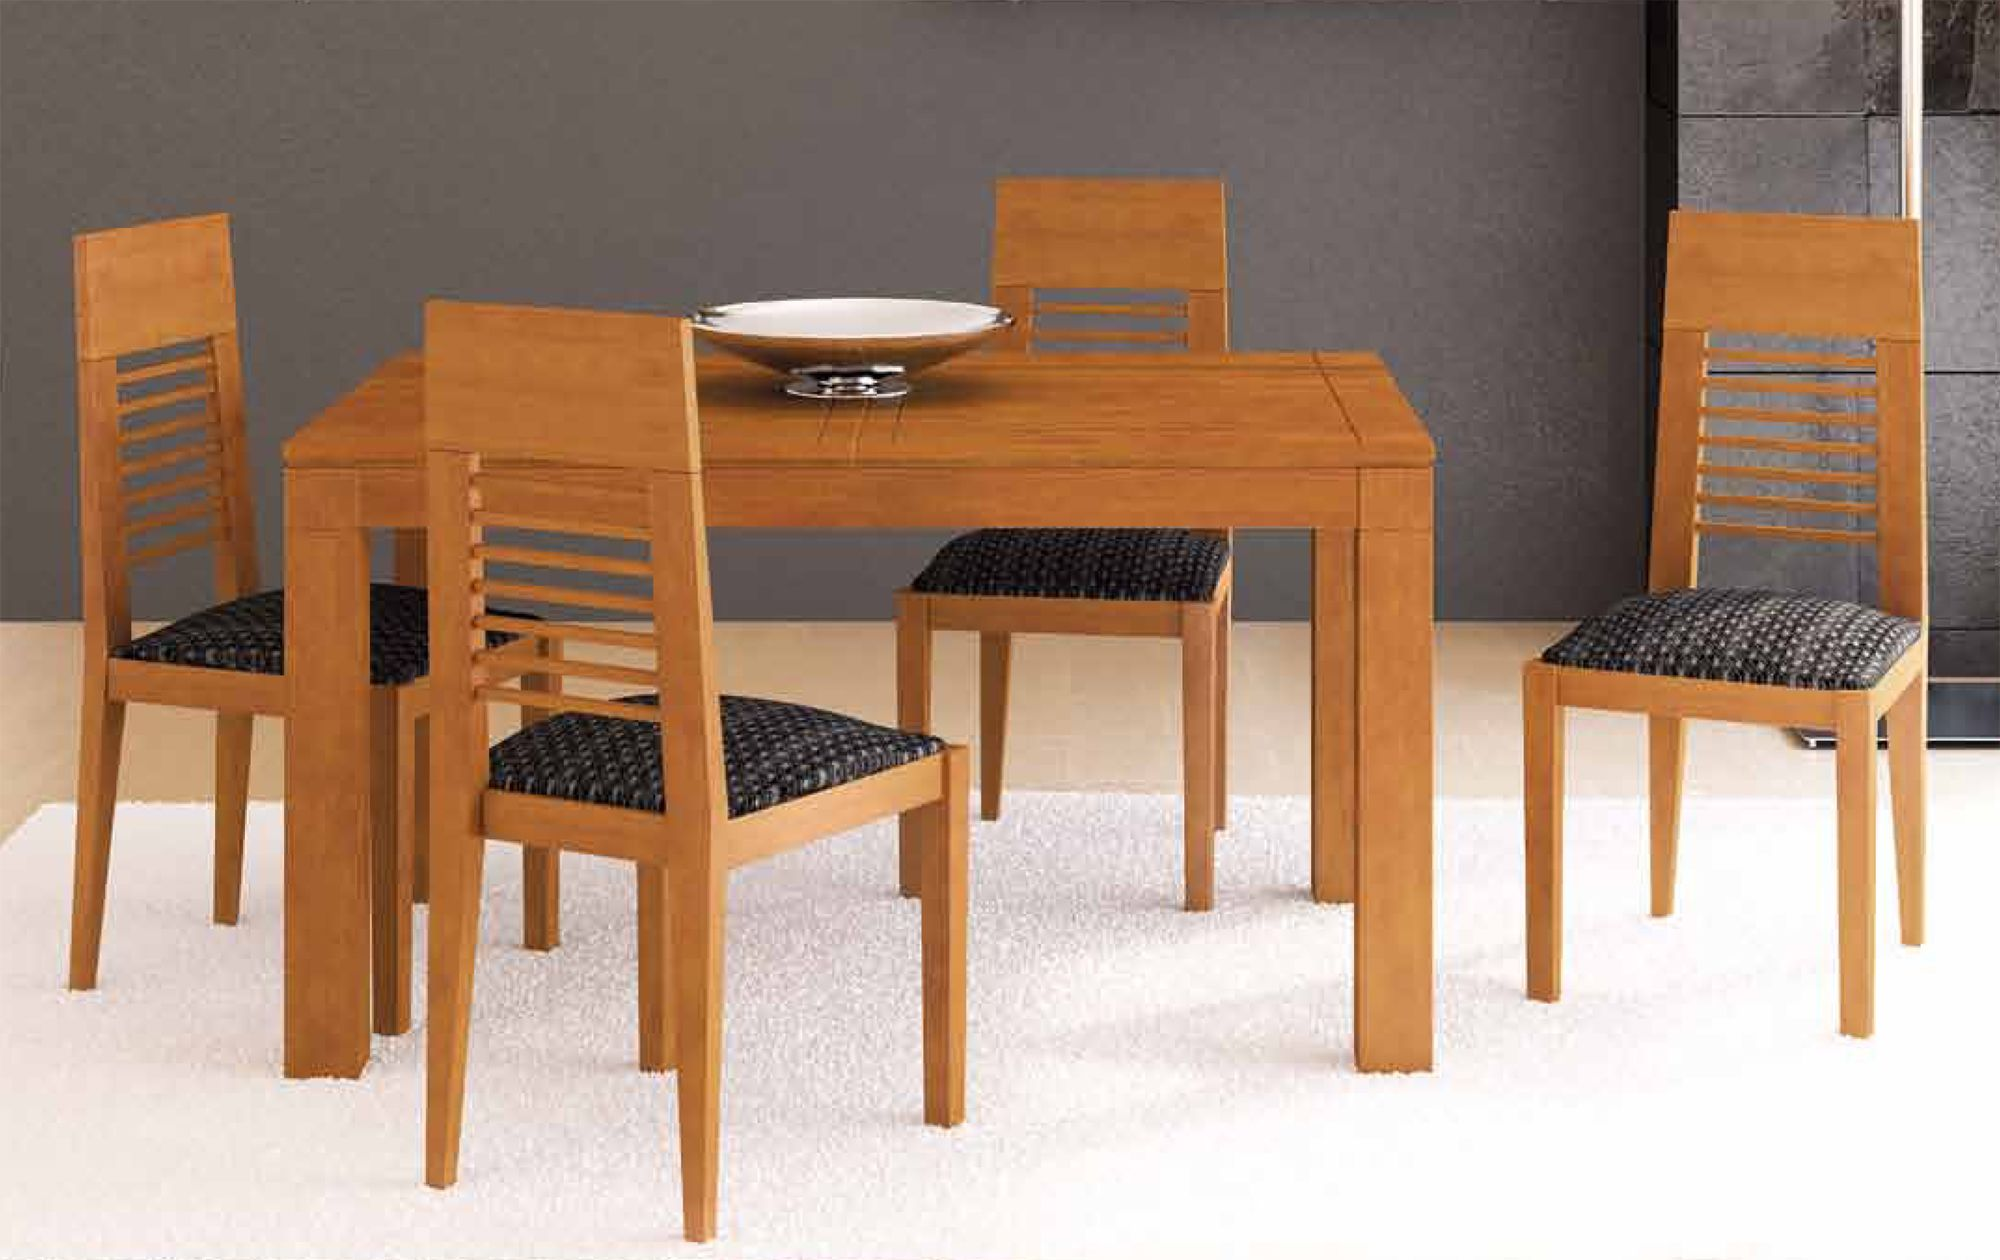 Mesa de comedor de 140x90 cm., con tapa de madera y extensible a ...